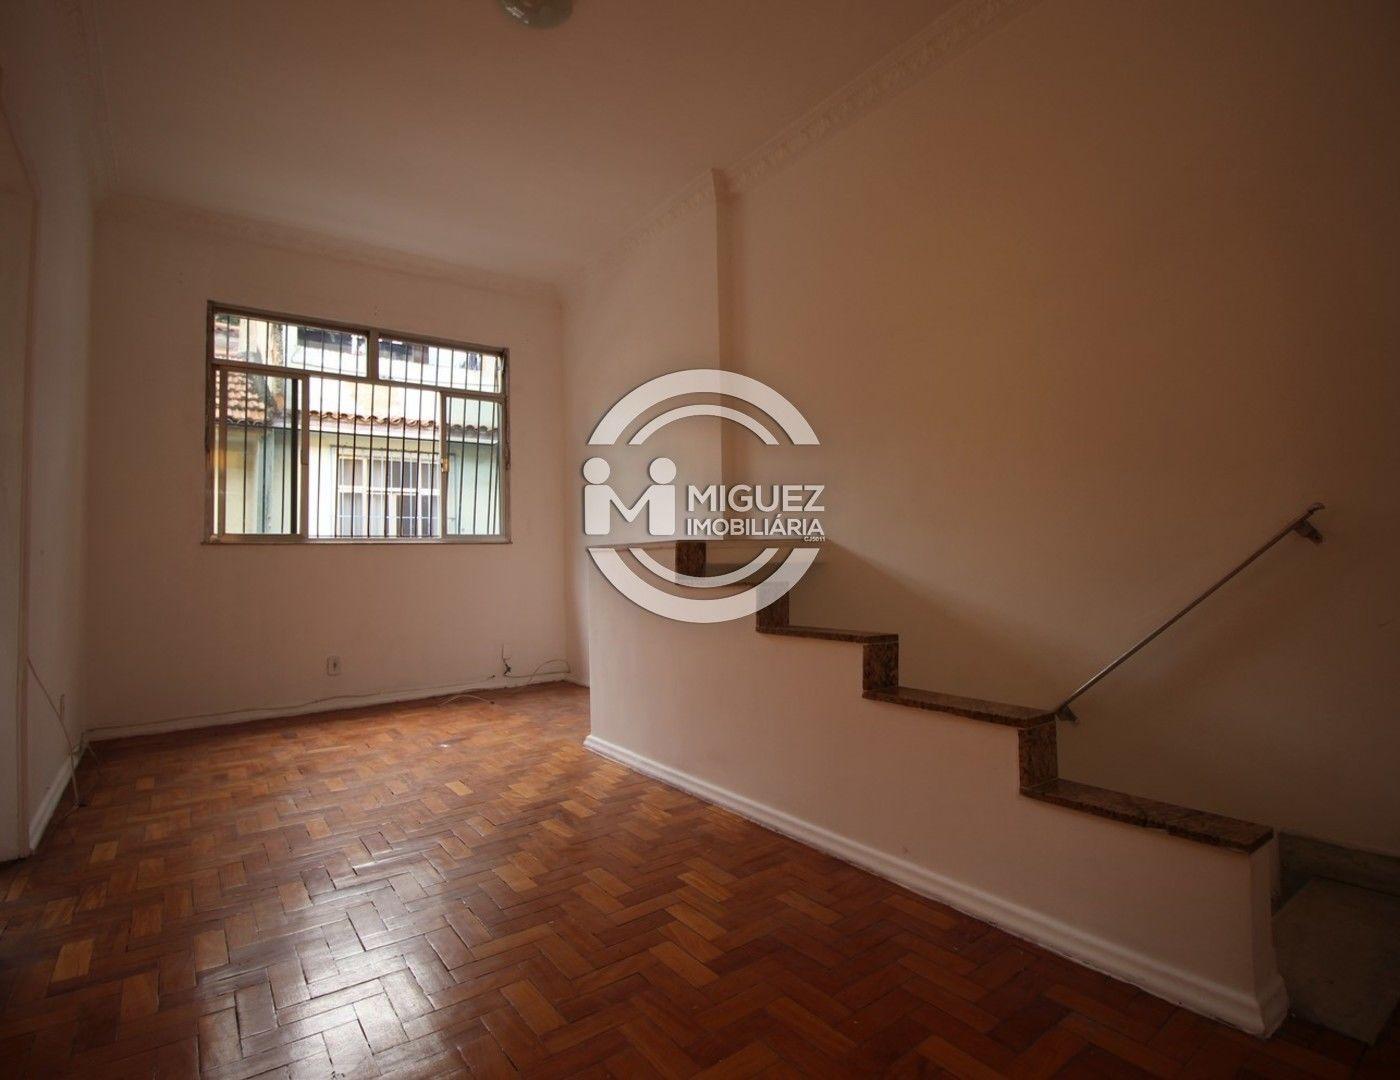 Apartamento, aluguel, Rua Almirante Cochrane - Tijuca , Rio de janeiro